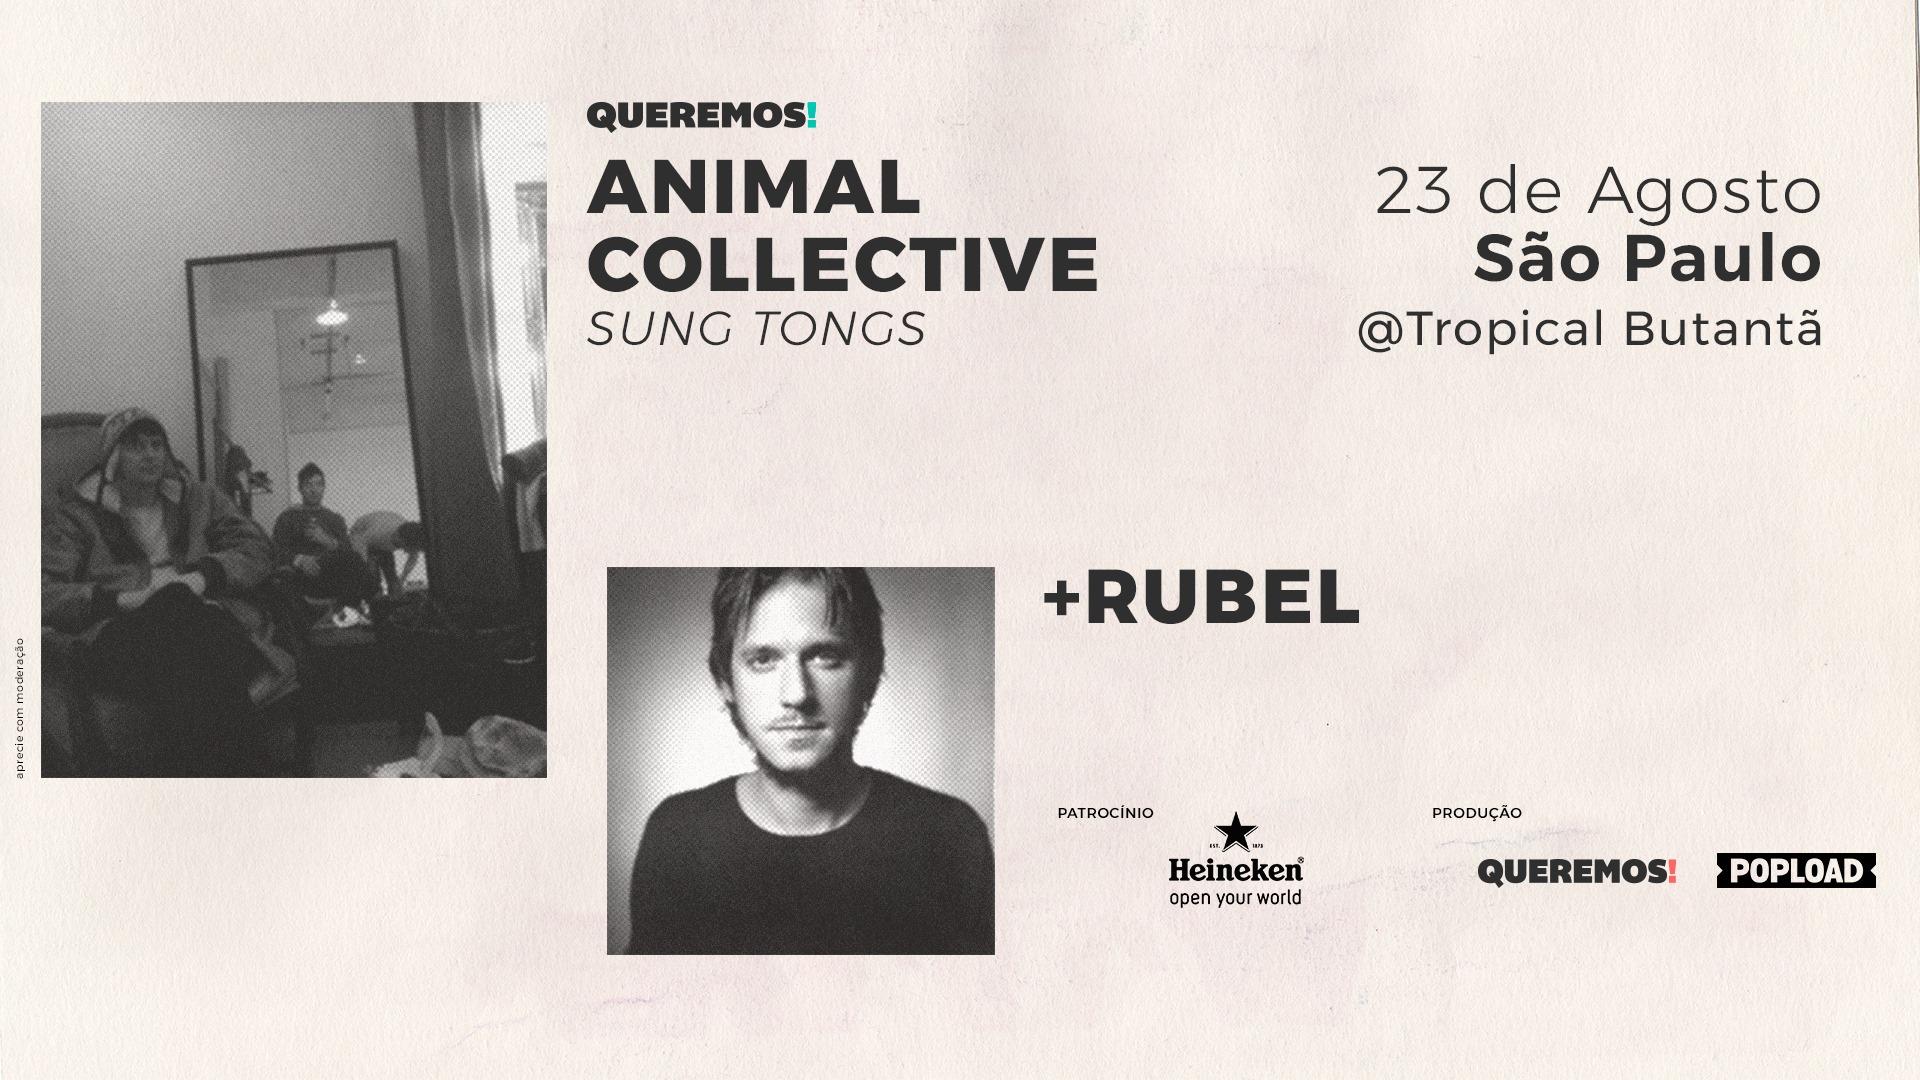 animal collective rubel queremos popload